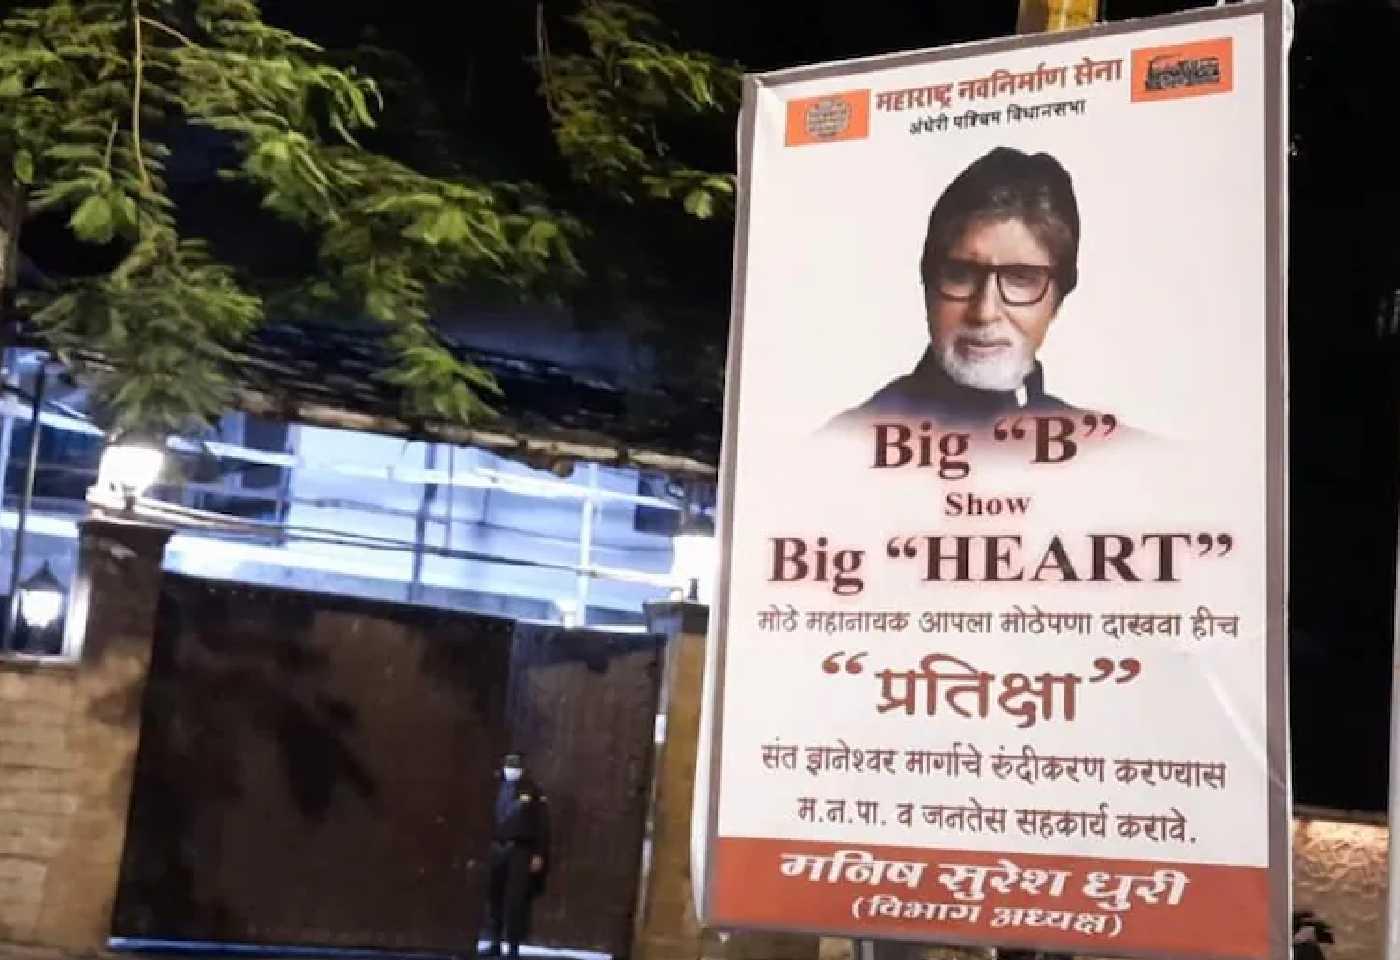 MNS Posters Outside BIG B amitabh Bachchan Bunglow Pratiksha